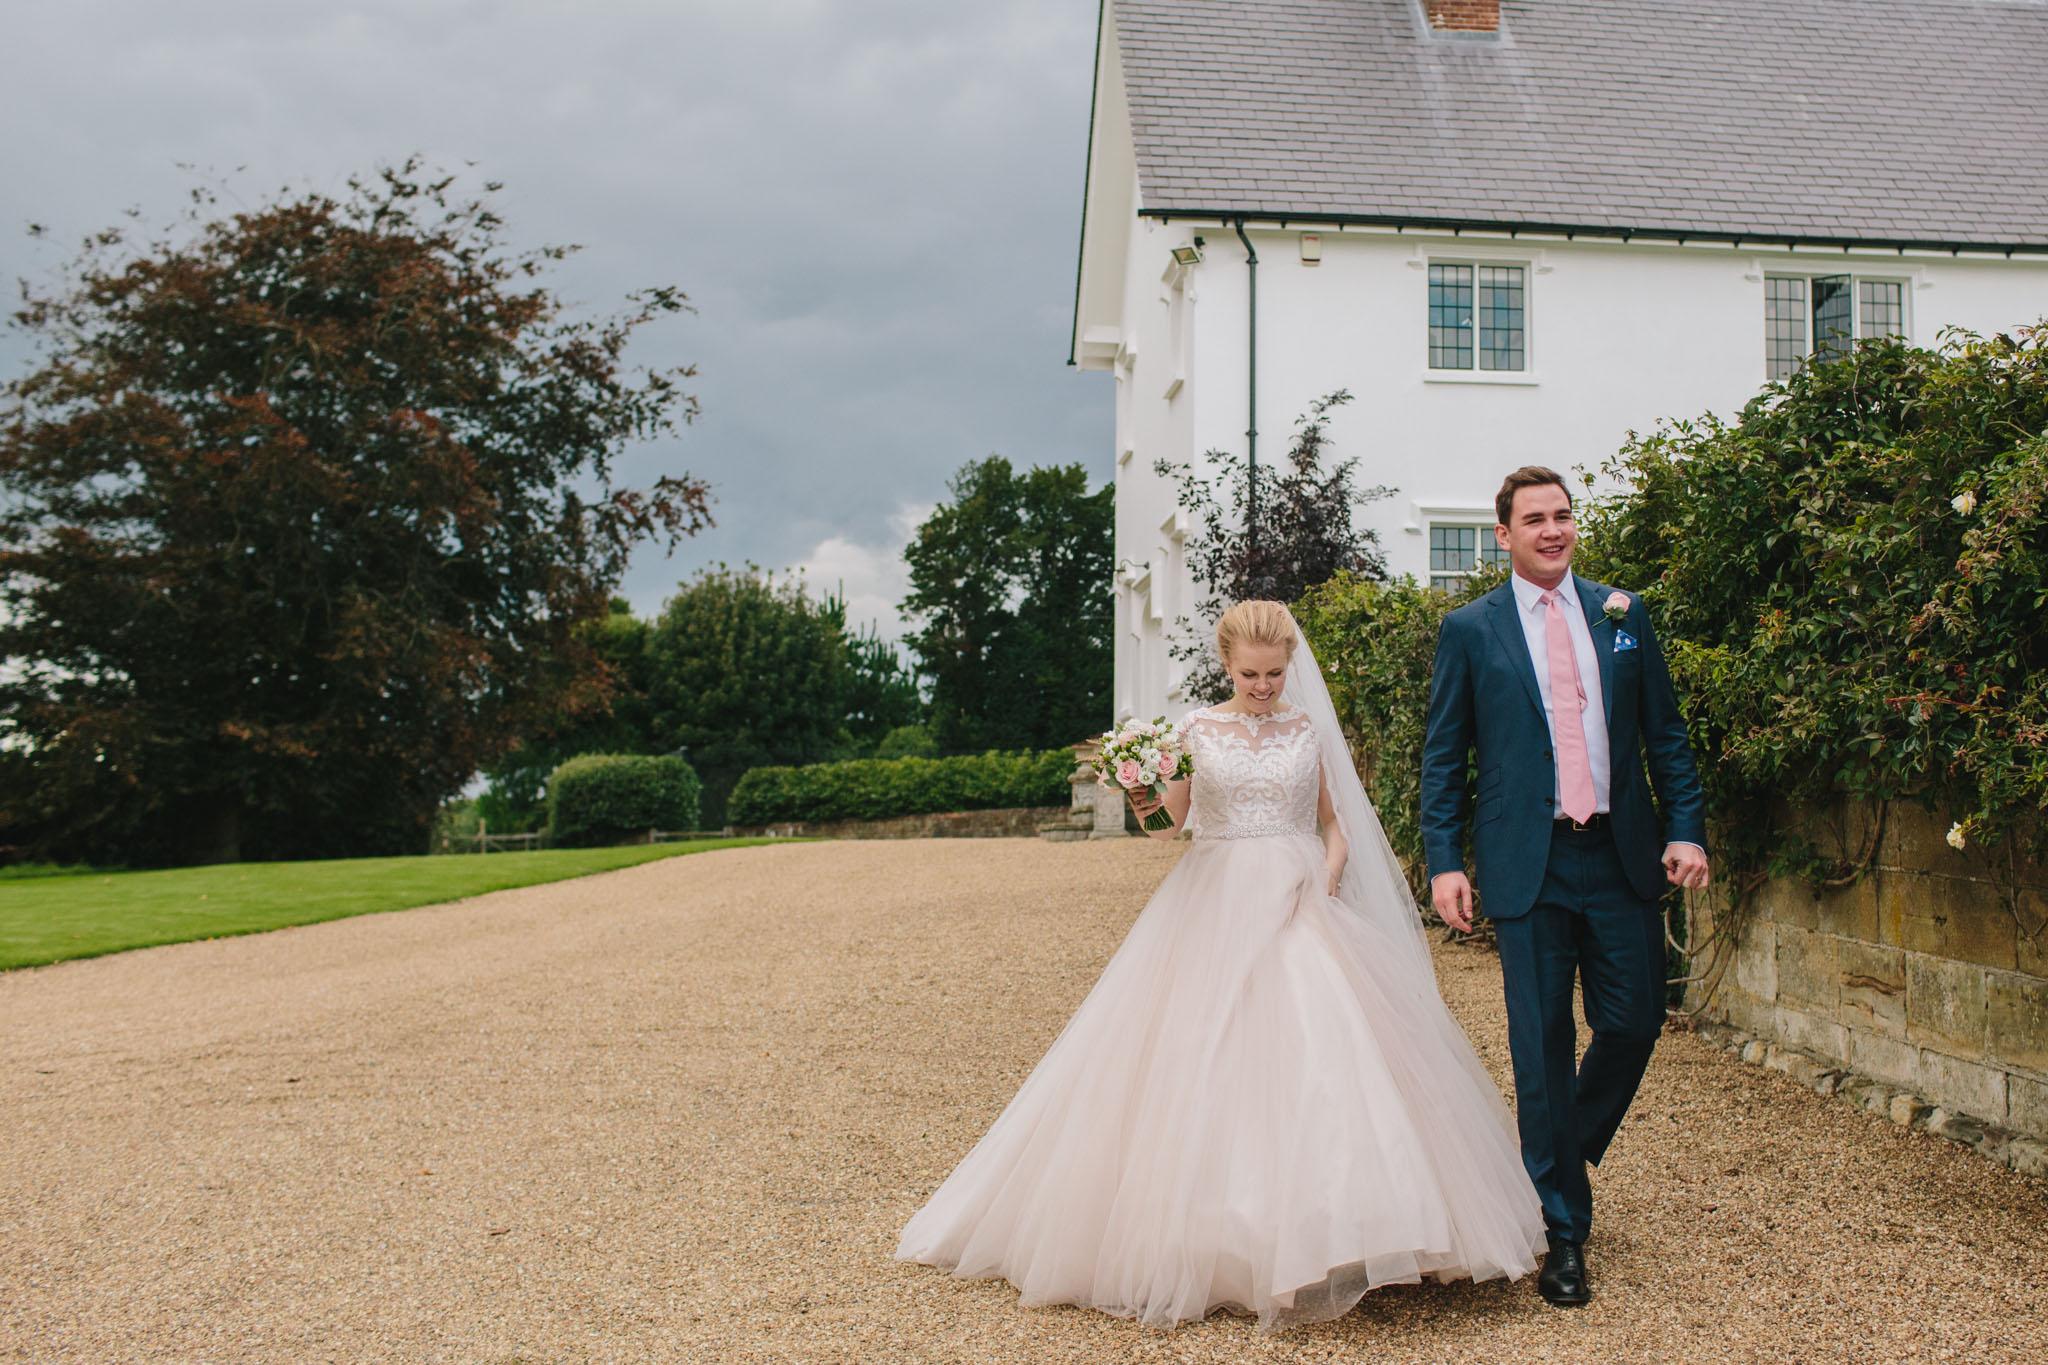 hendall manor barns wedding-45.jpg